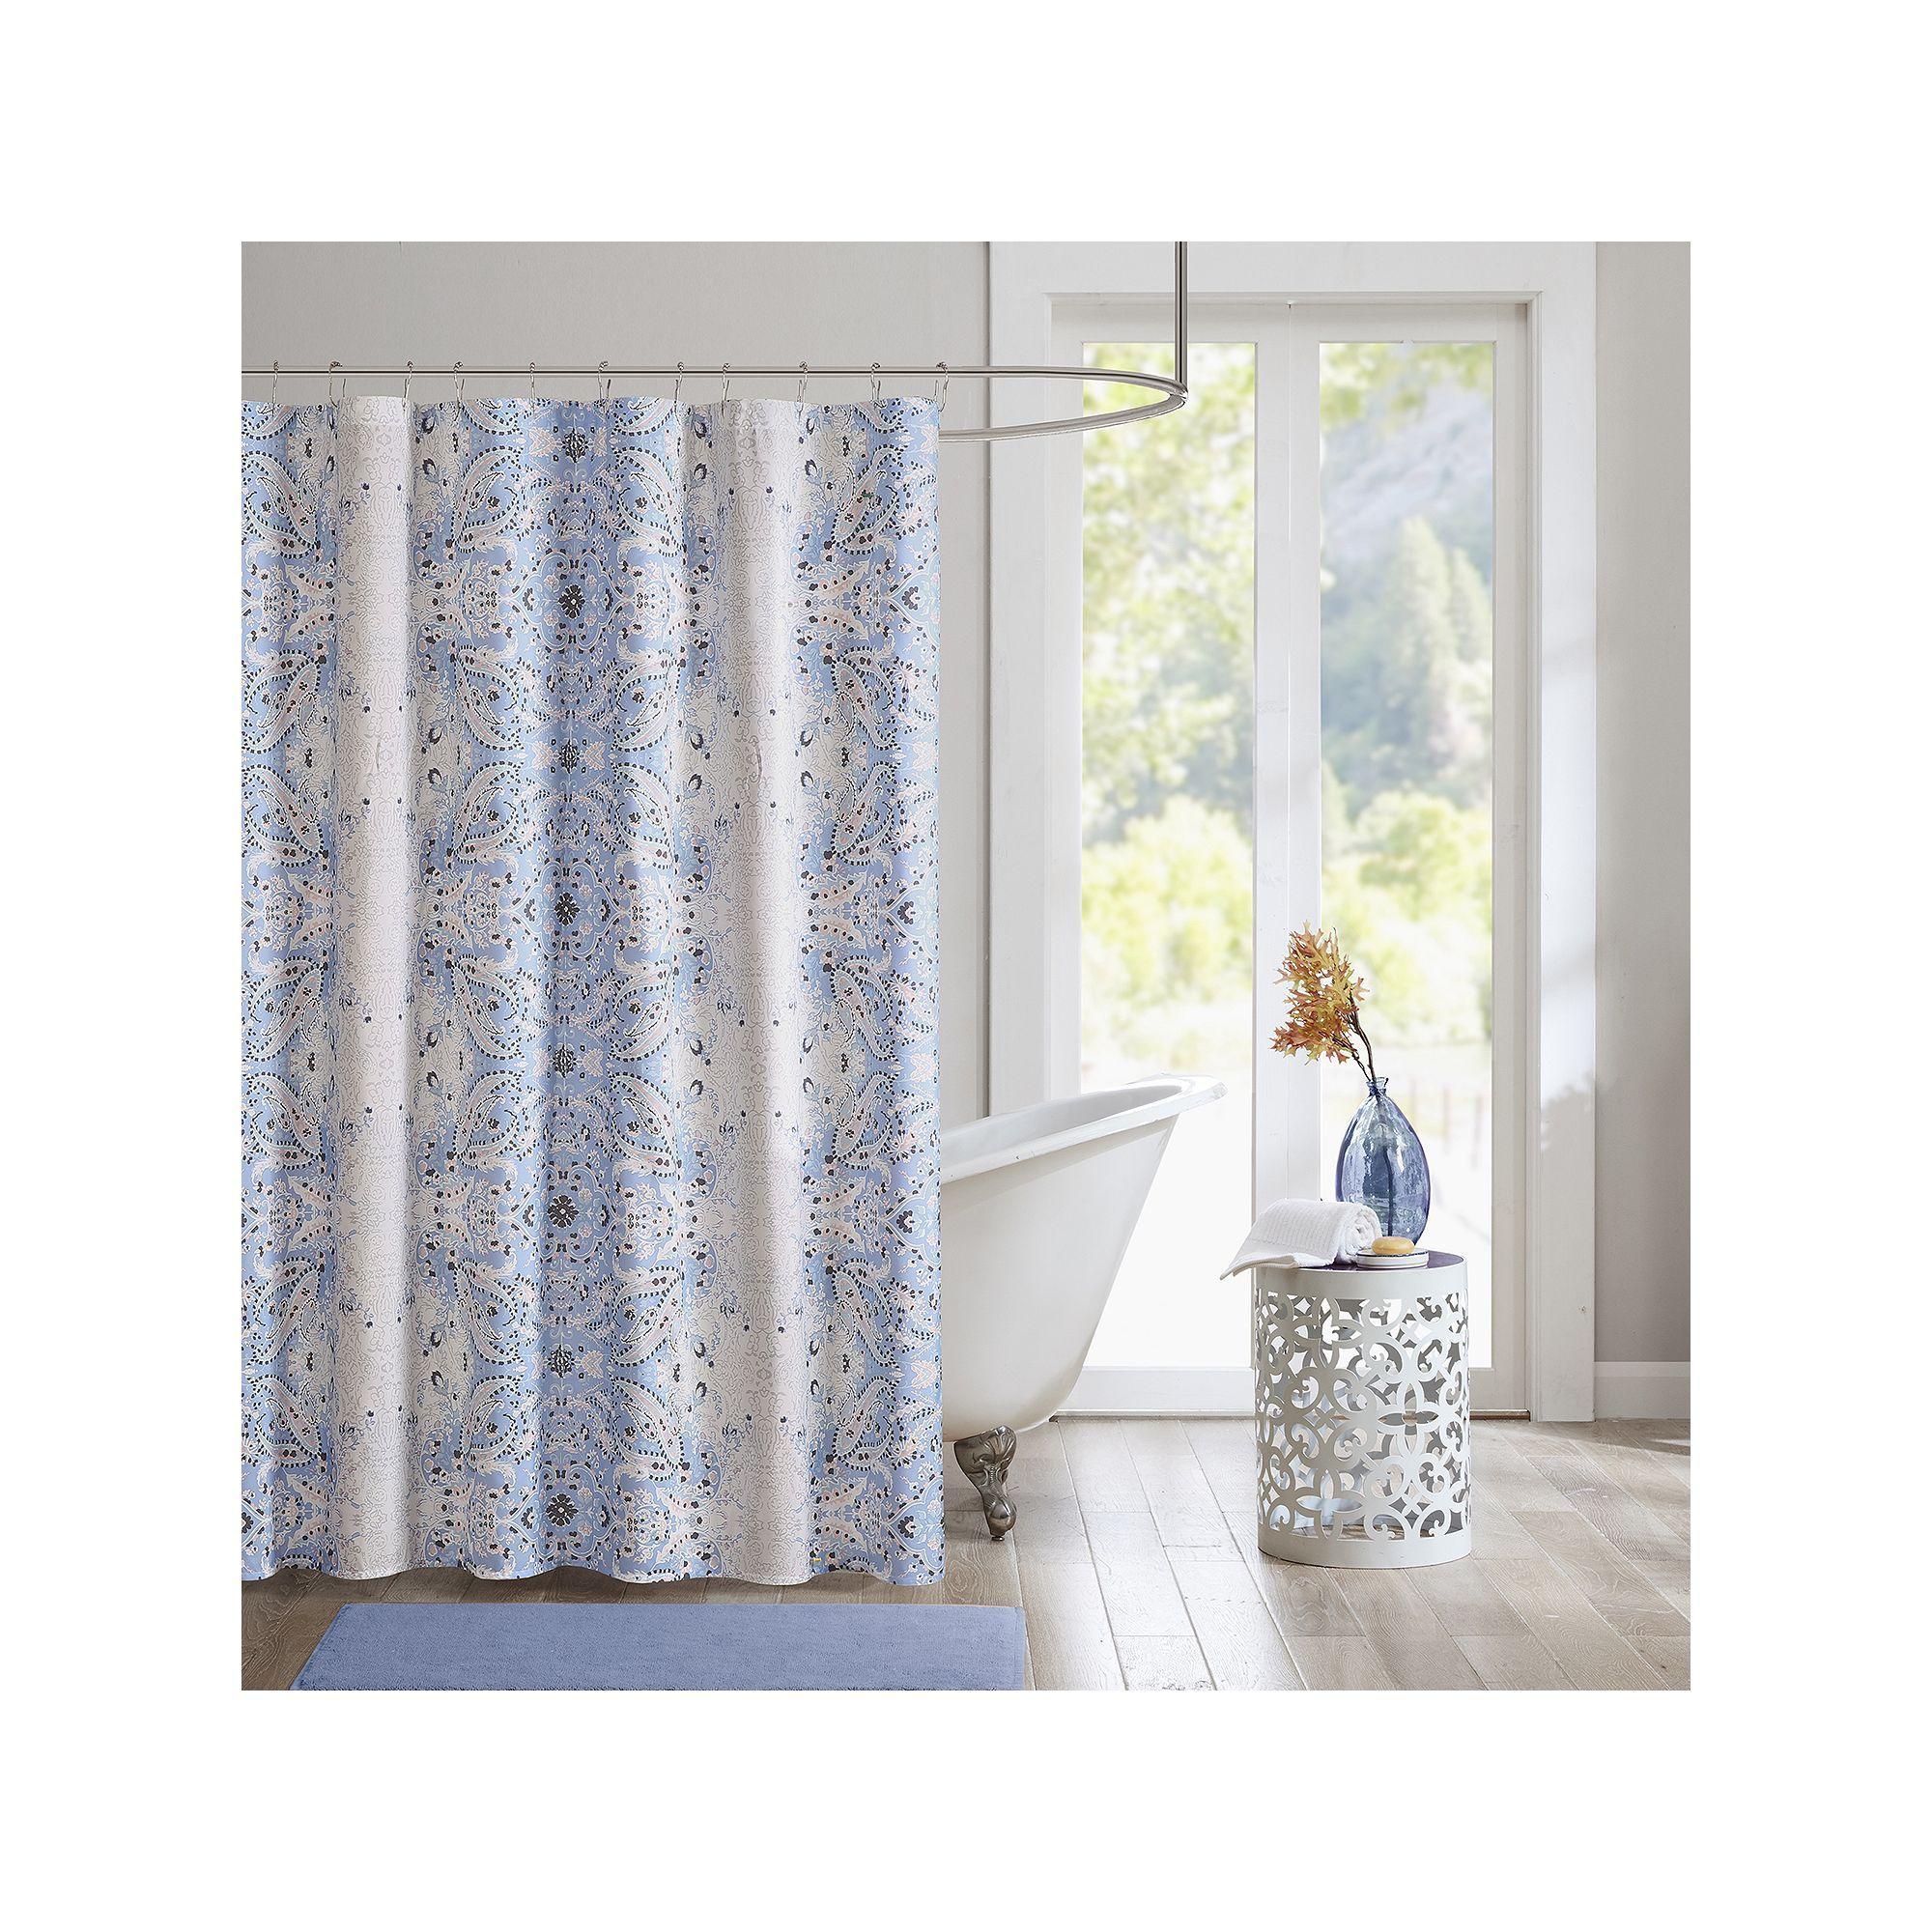 Intelligent design raina microfiber printed shower curtain products